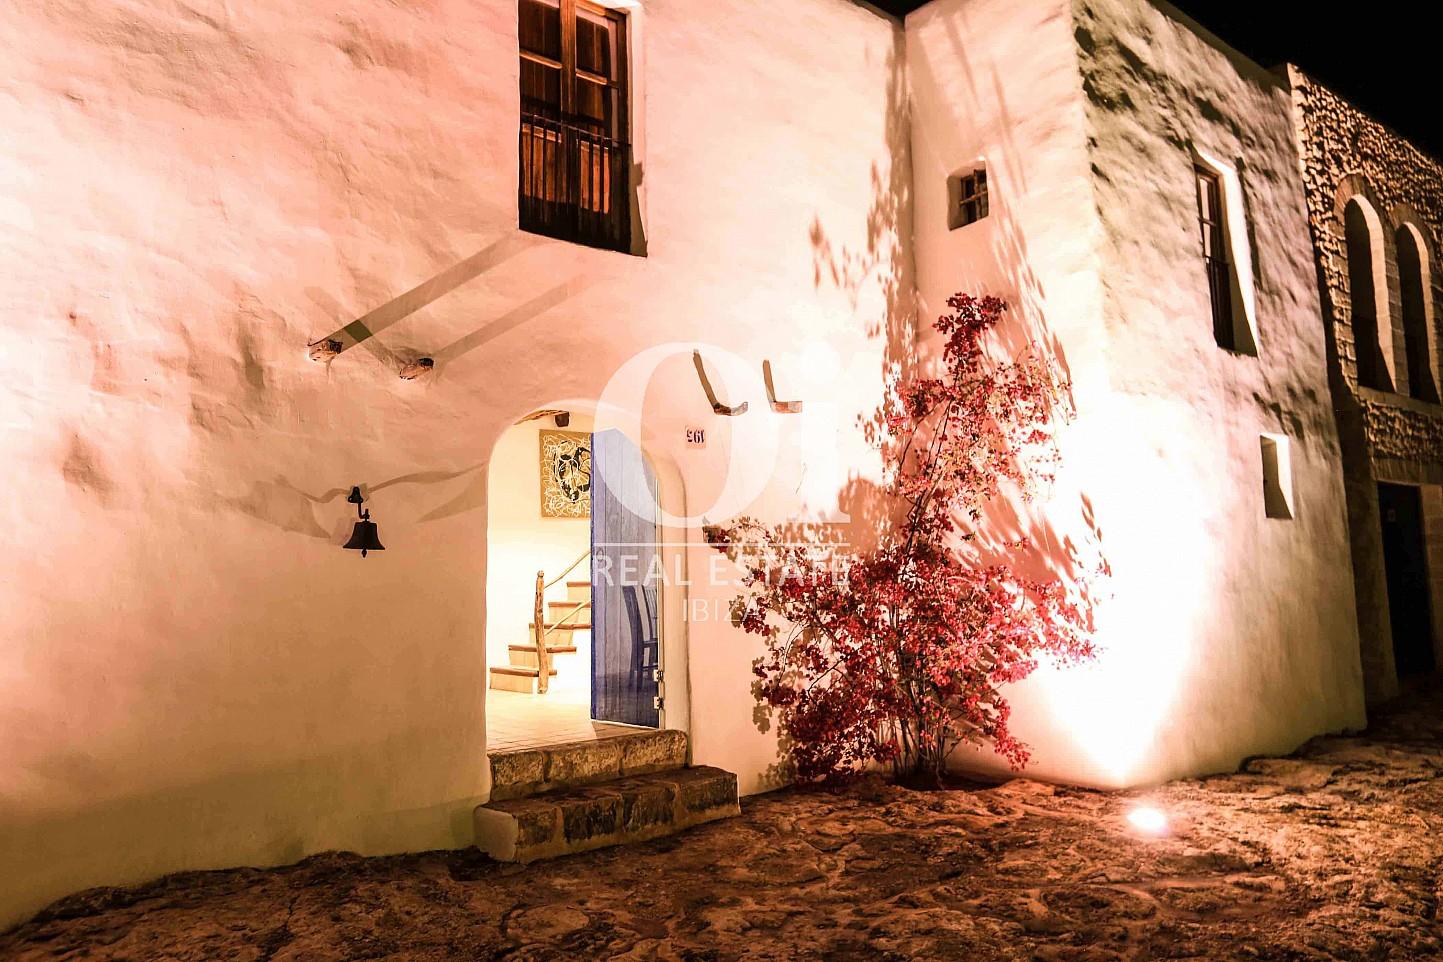 Fachada de casa en alquiler vacacional en zona Puig d'en Valls, Ibiza